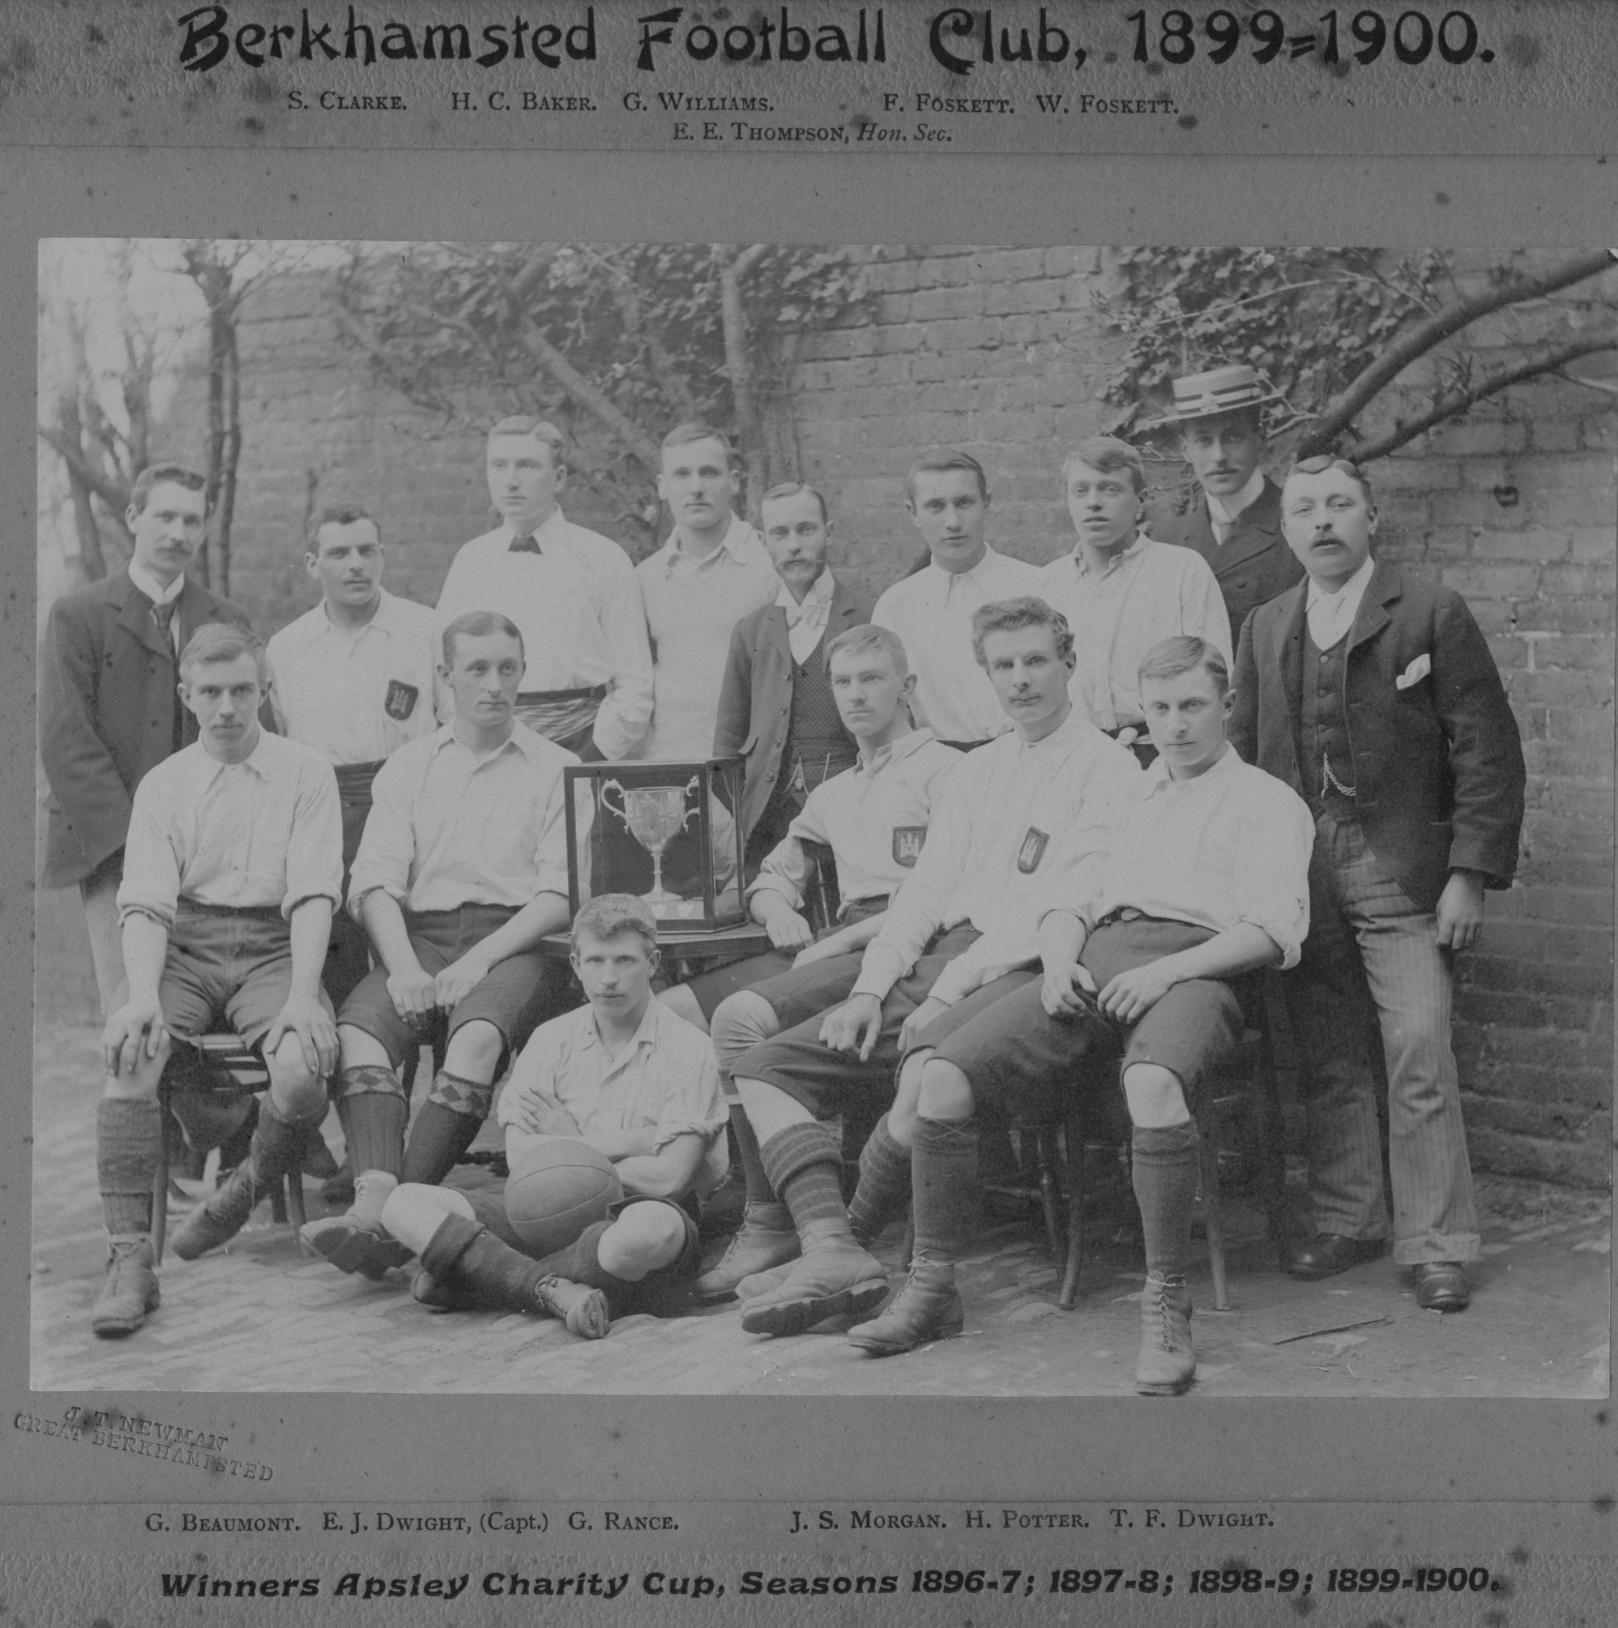 Berkhamsted F.C. 1899:00